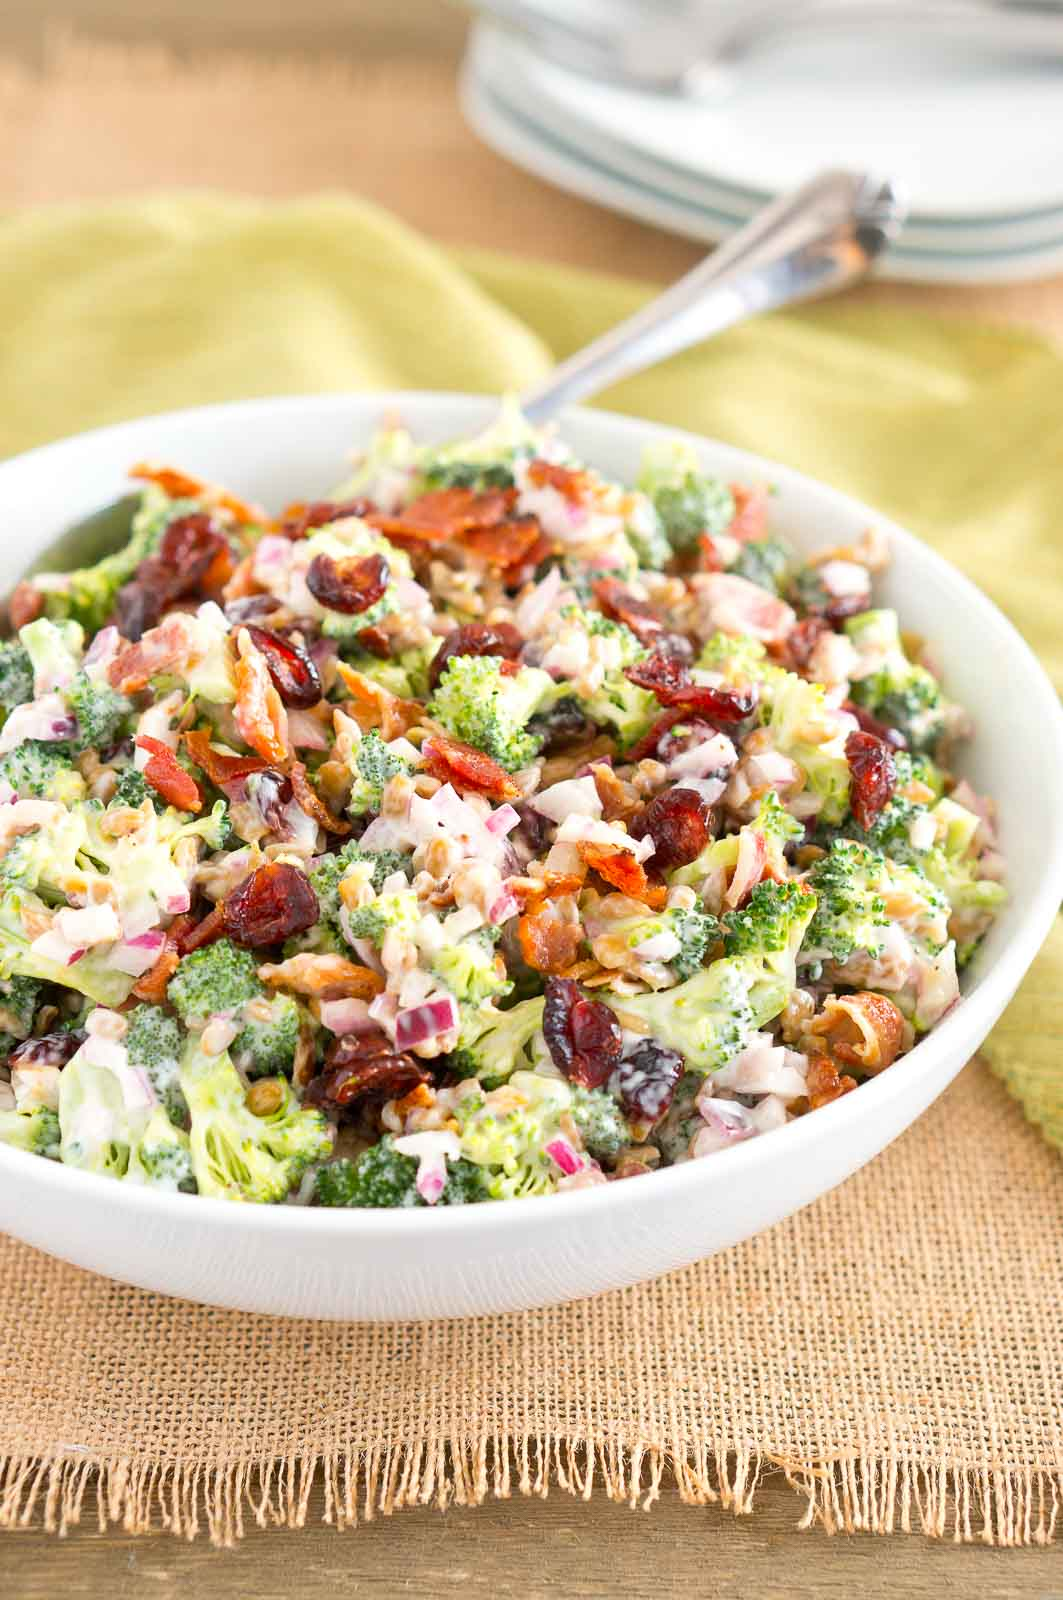 How to make broccoli salad dressing recipe